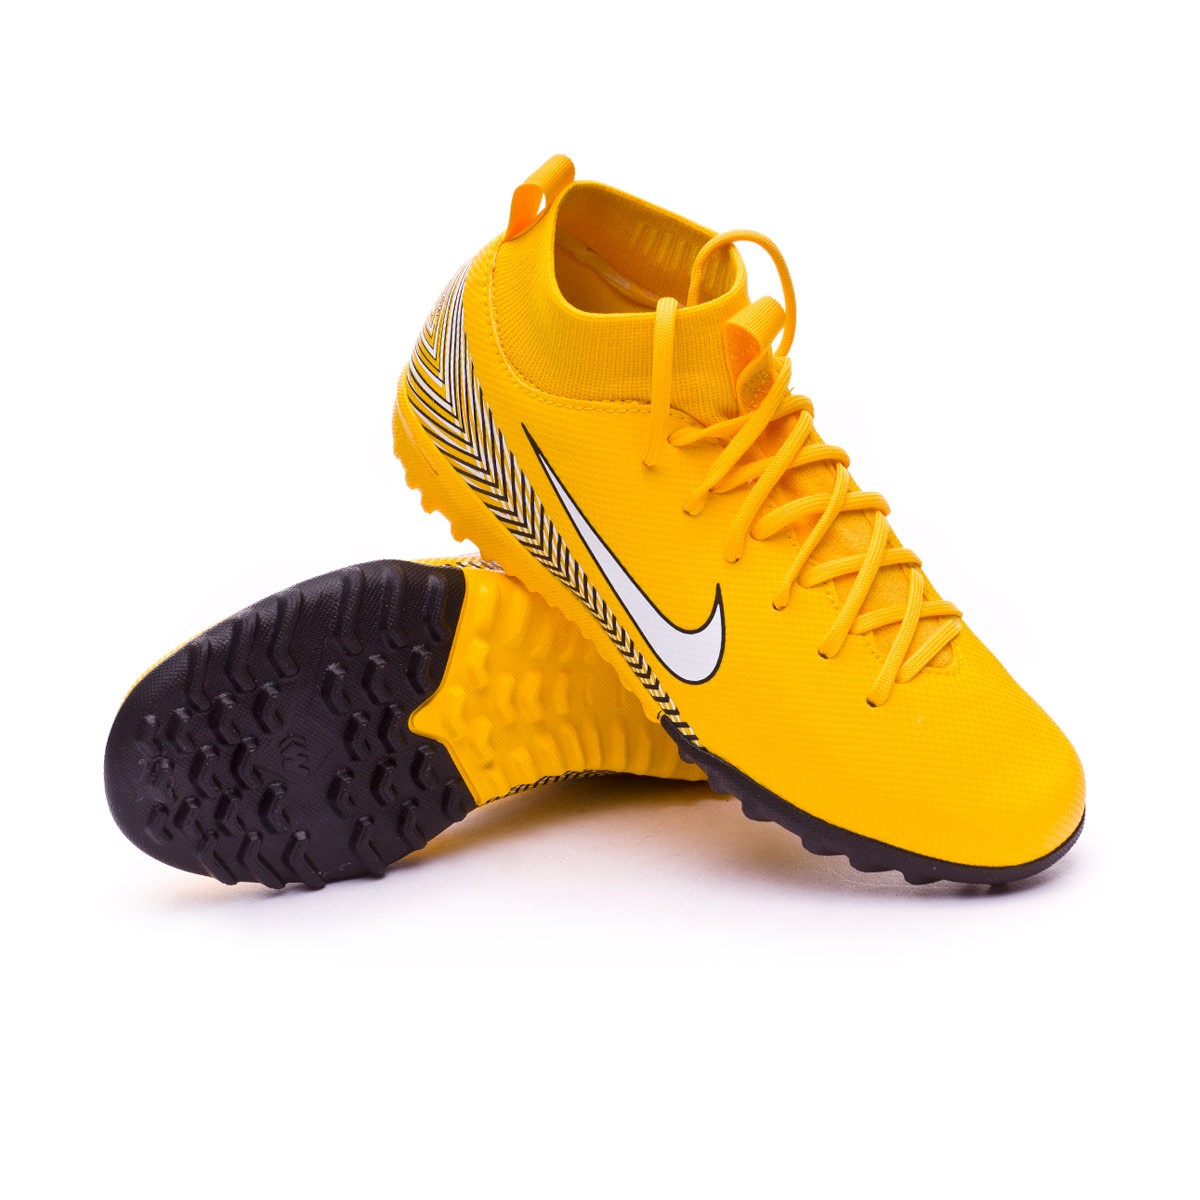 newest 88049 12777 ... shoes green black 410e7 892b6  order football boot nike kids mercurial  superflyx vi academy turf neymar 386c2 3ec29